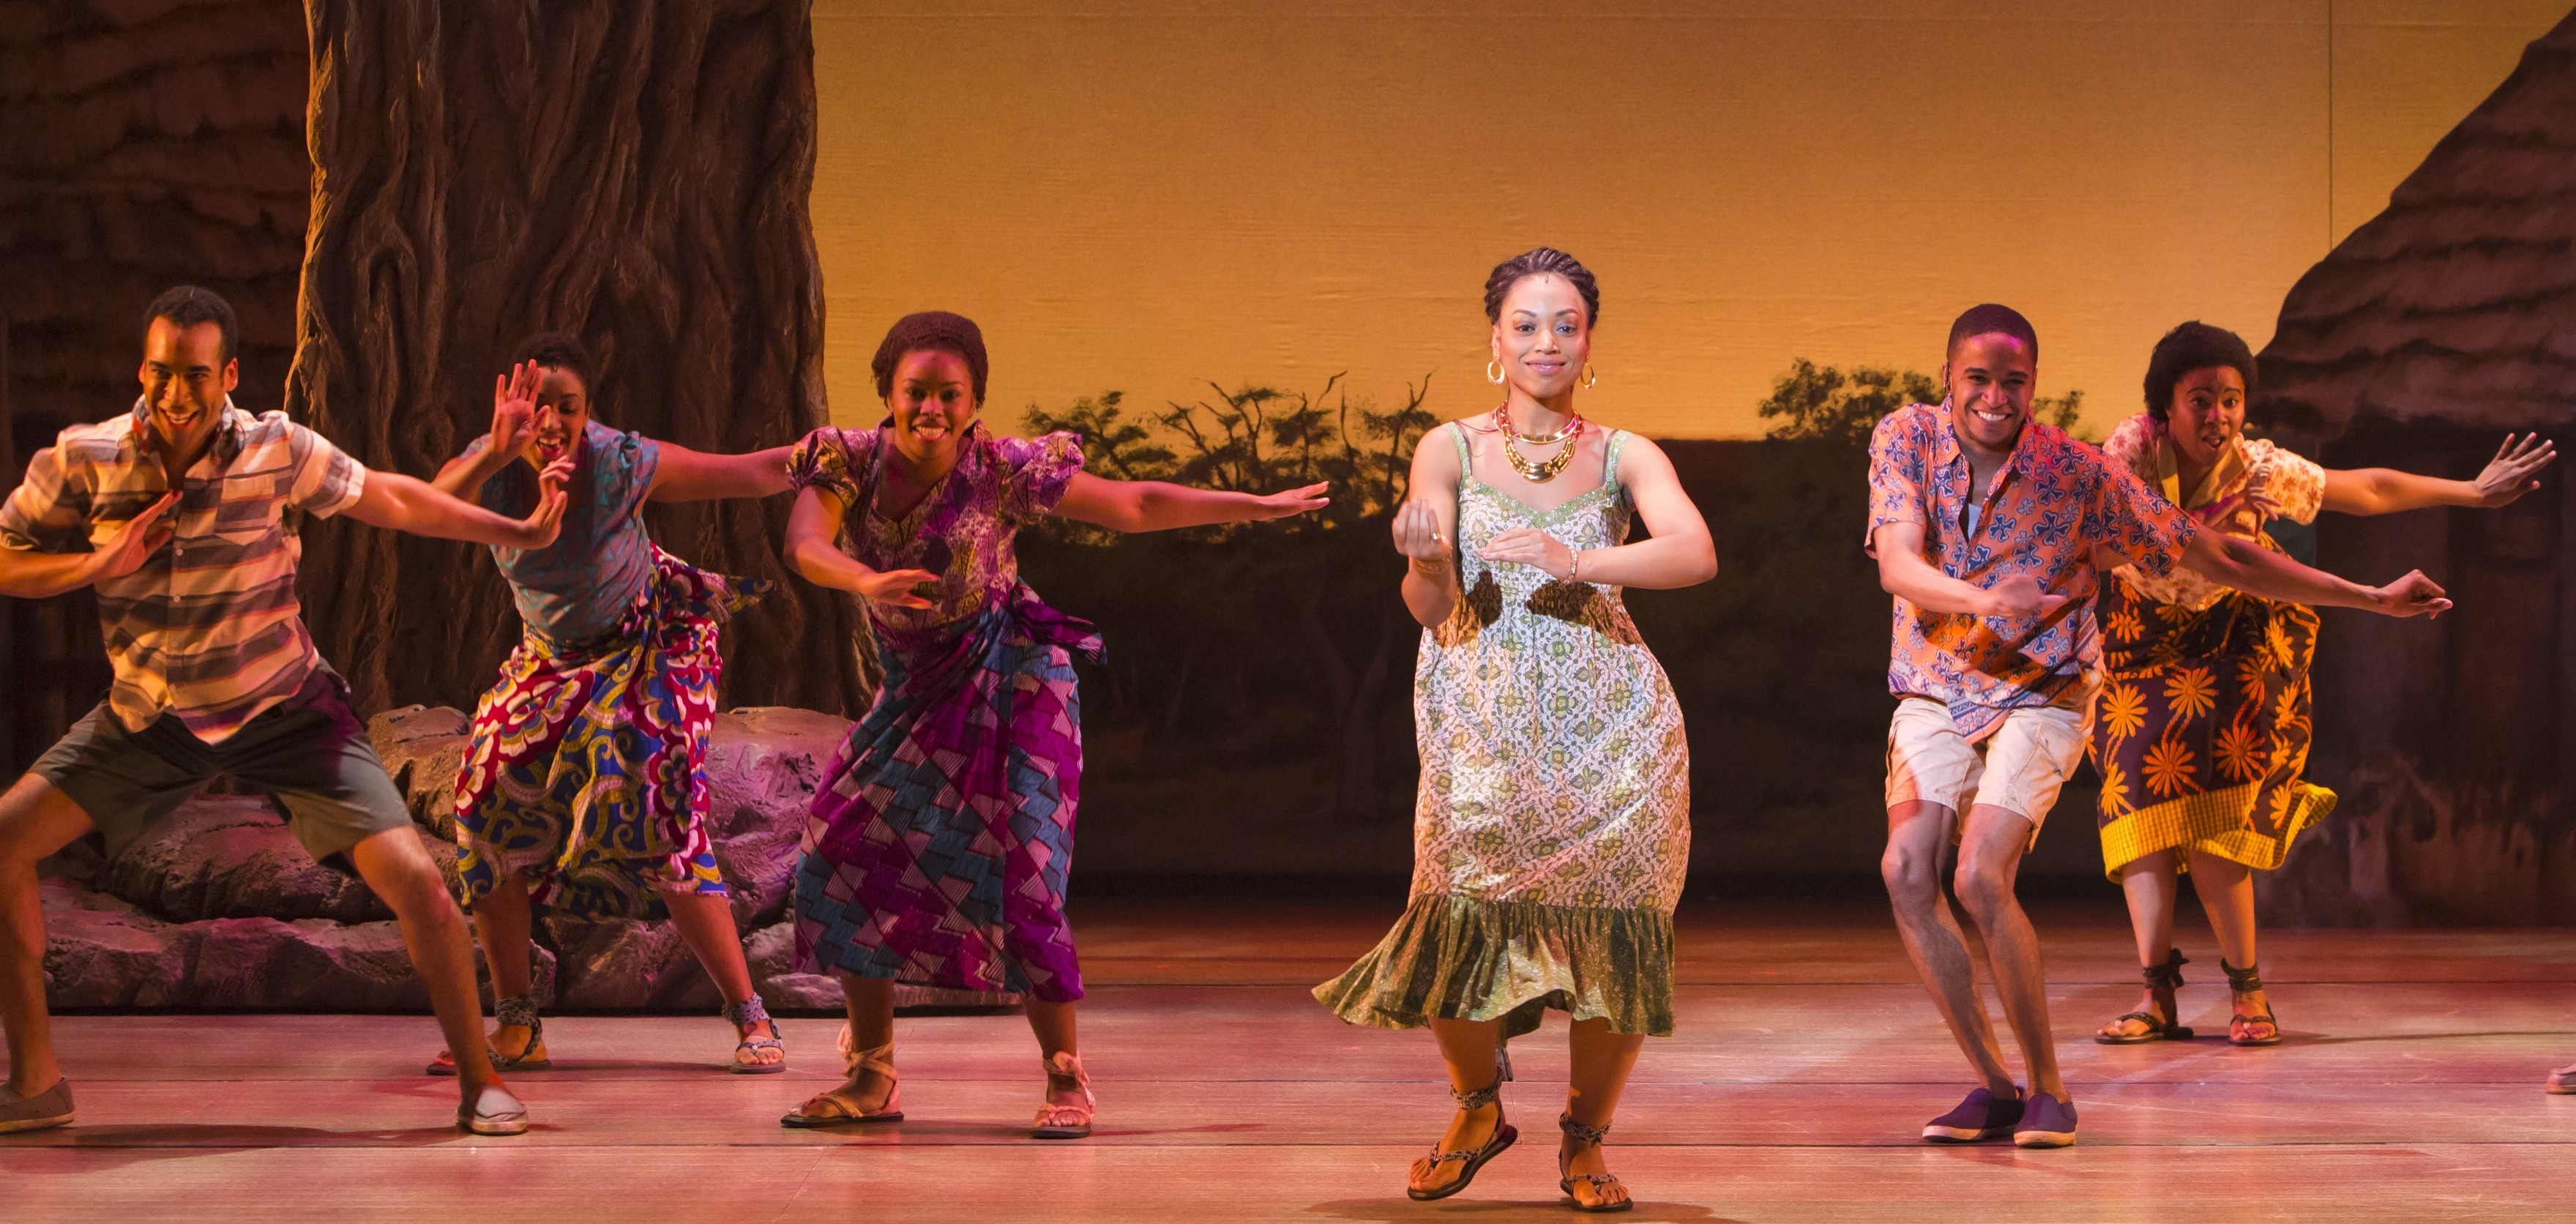 4. Balinda dancing, cropped